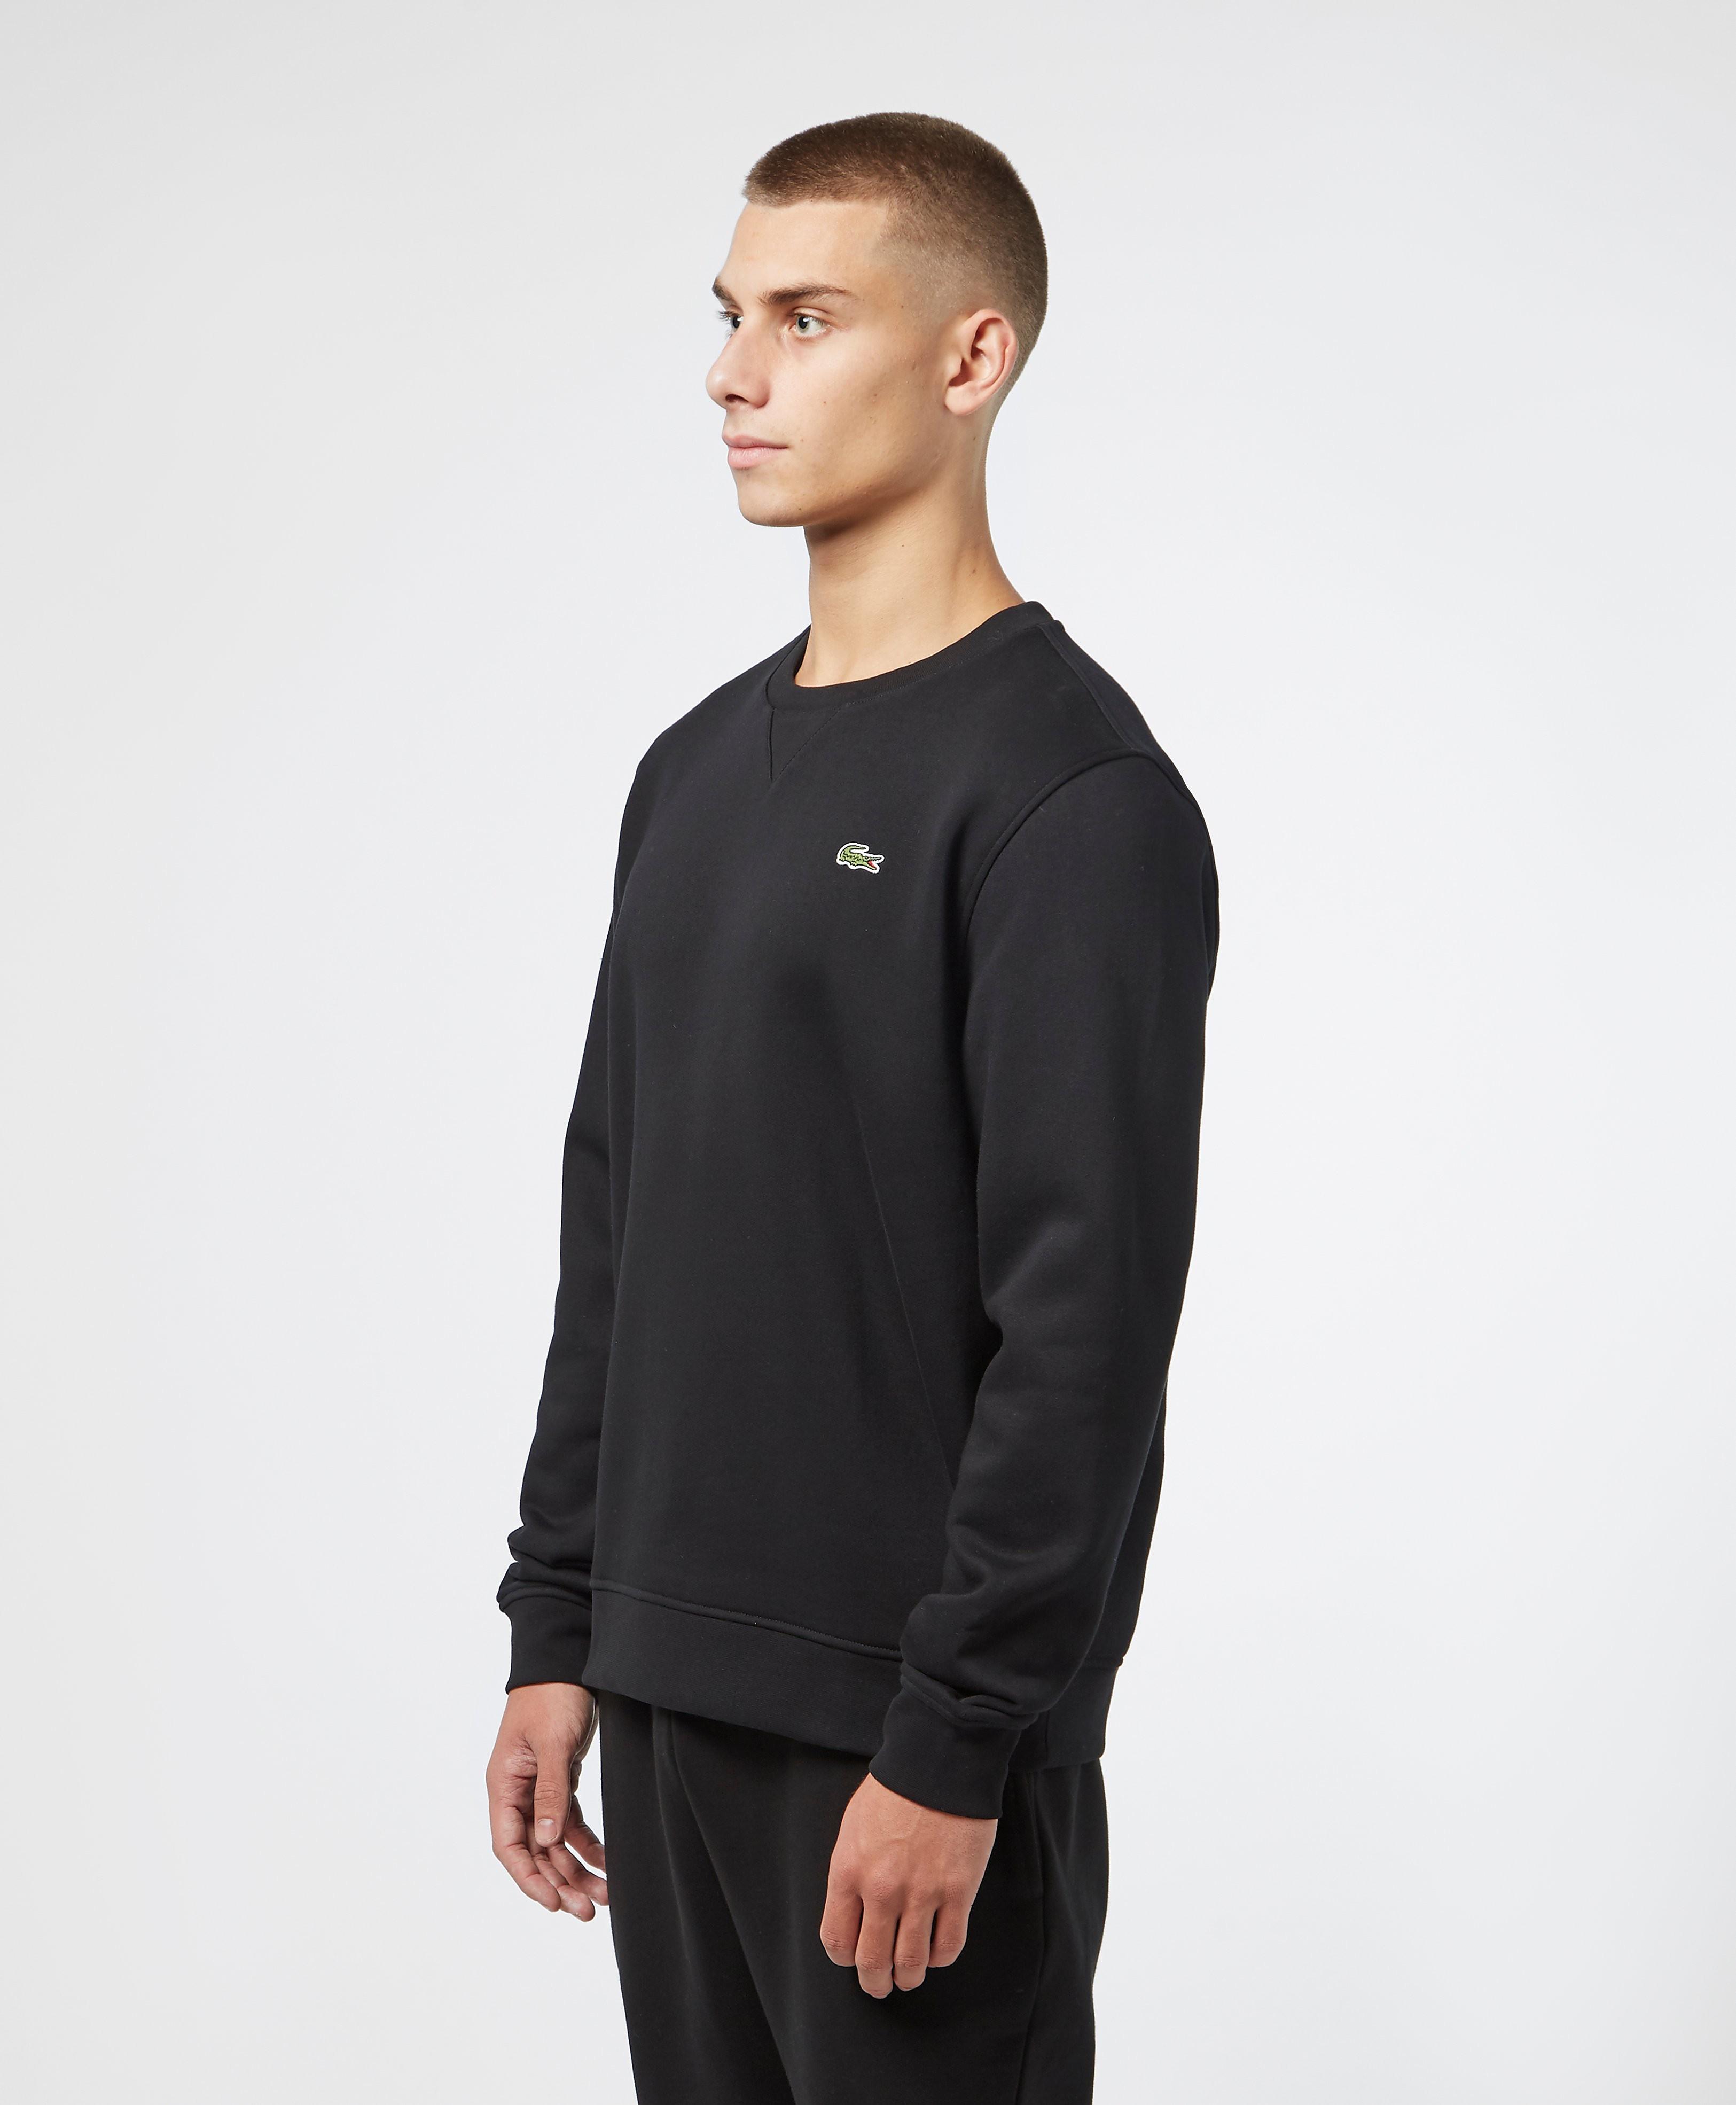 Lacoste Crew Sweatshirt